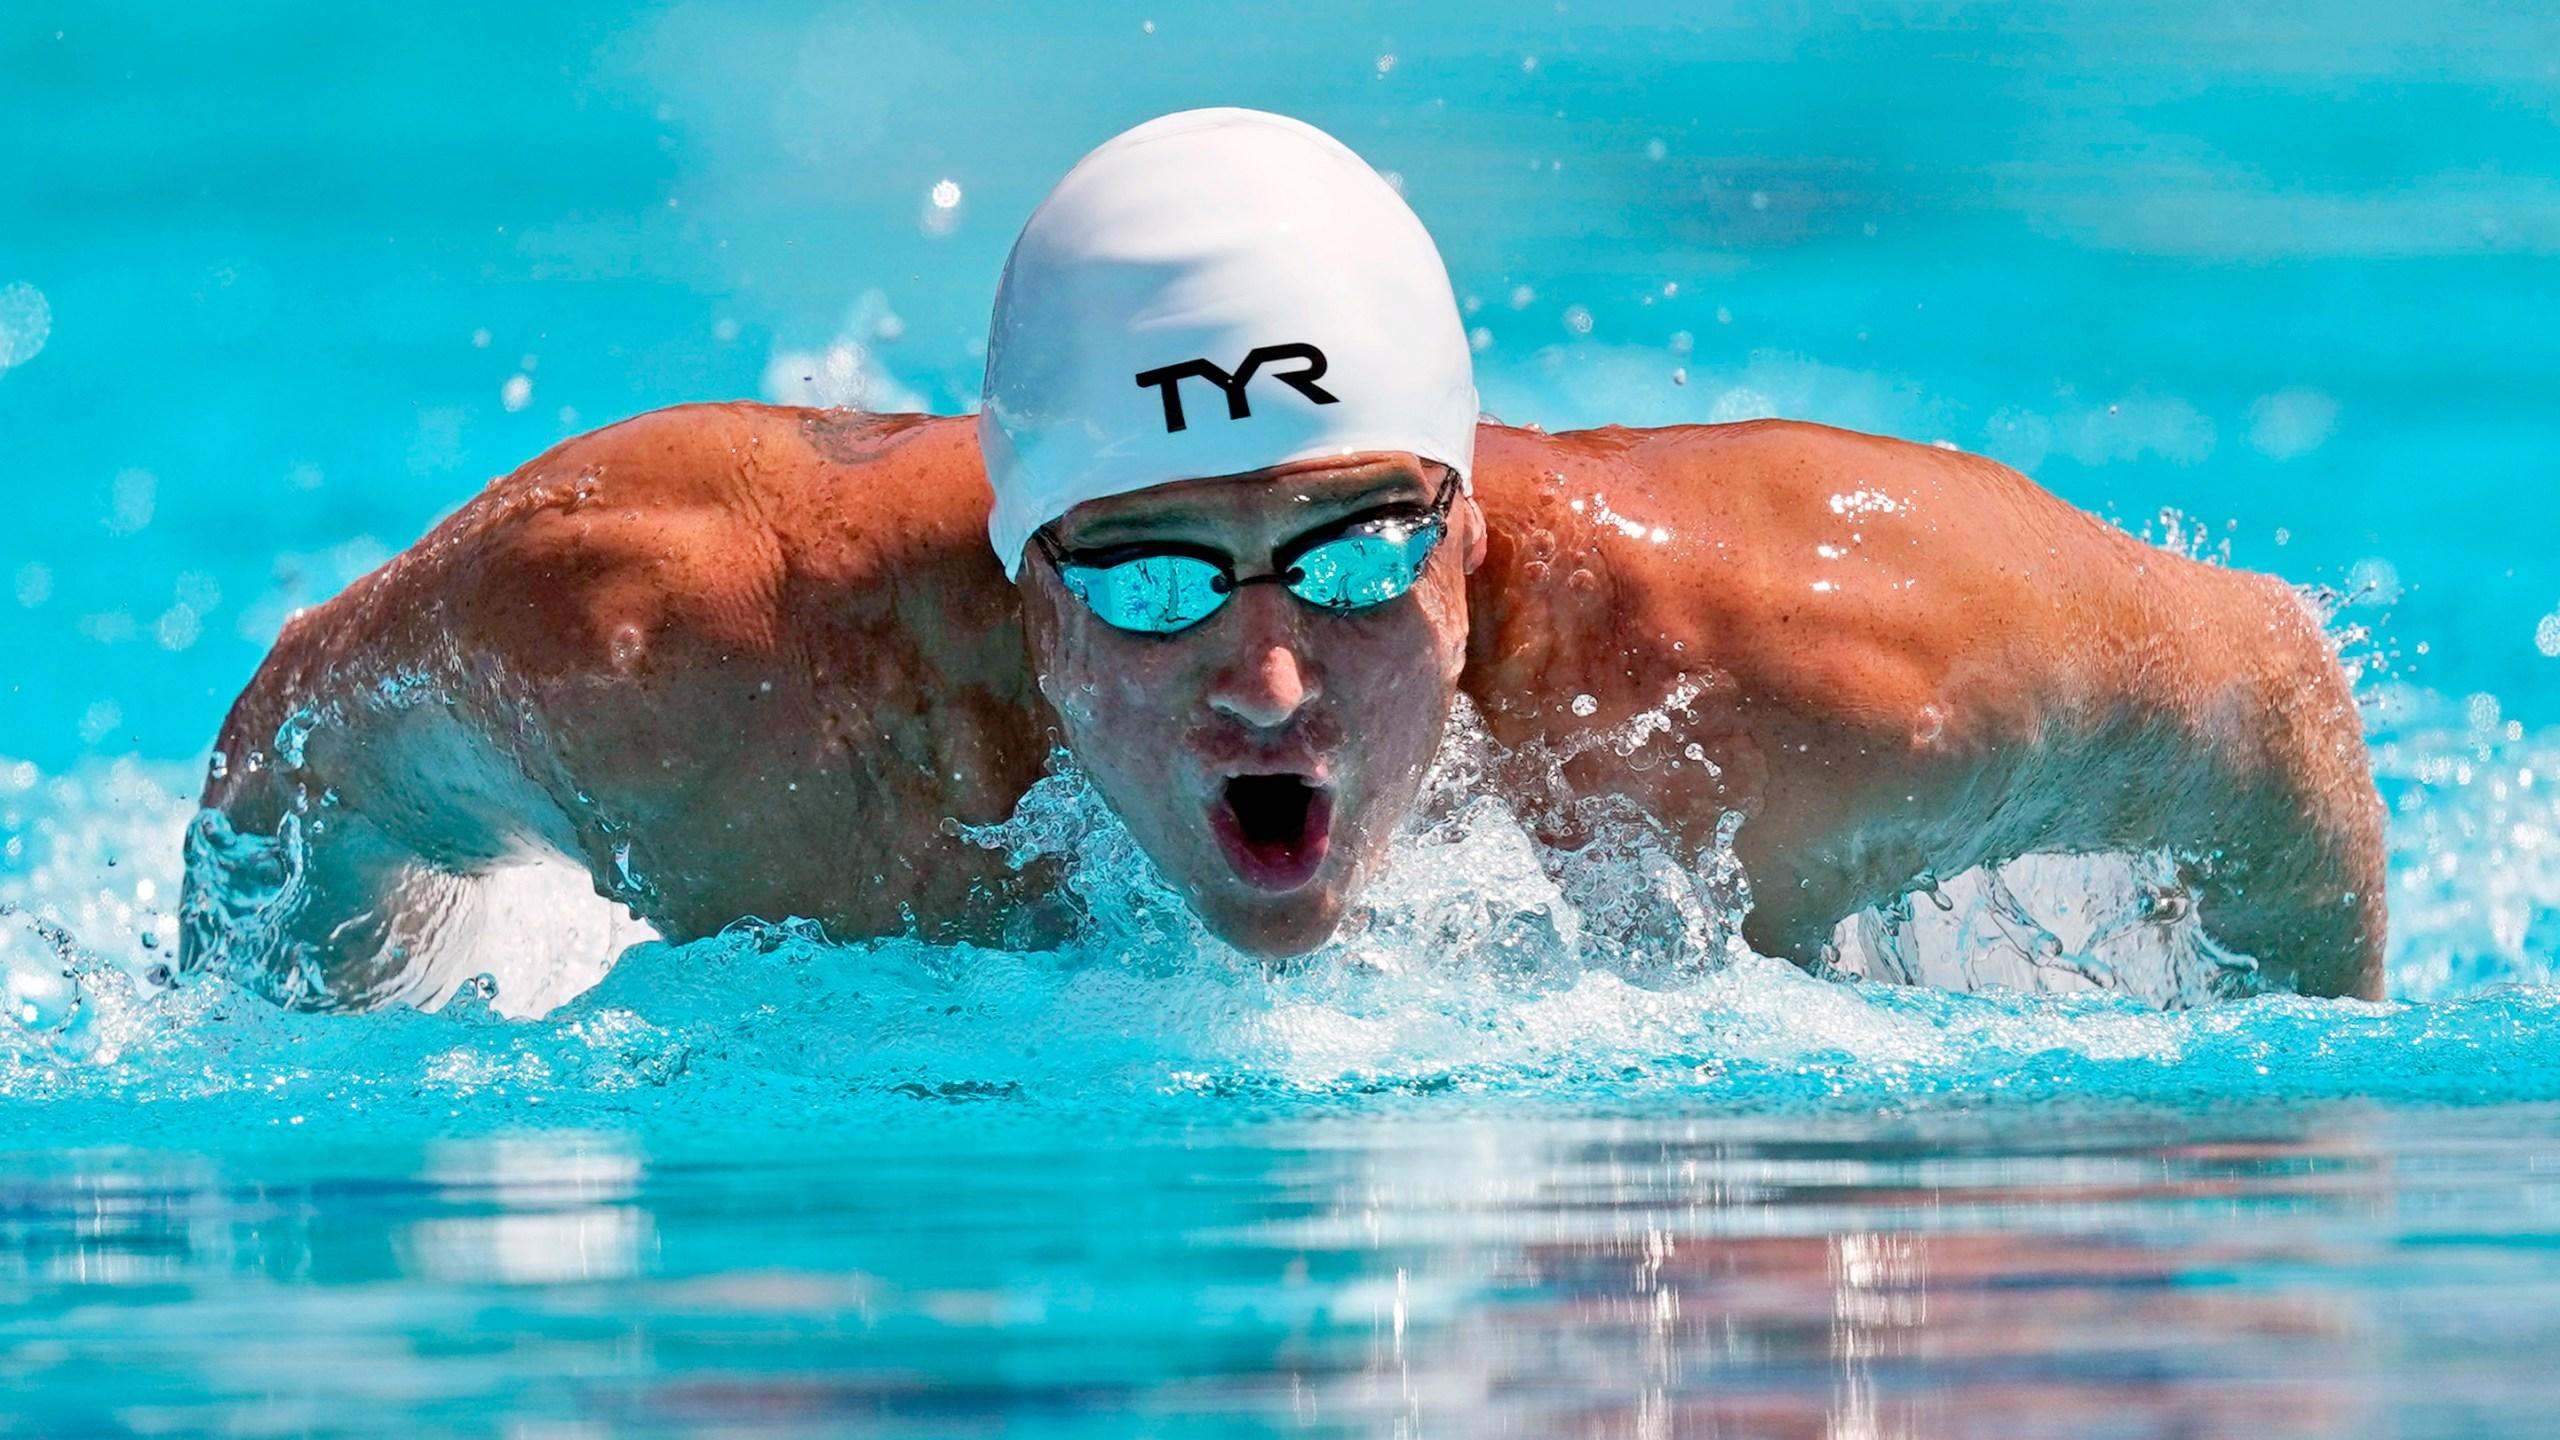 image of Ryan Lochte swimming